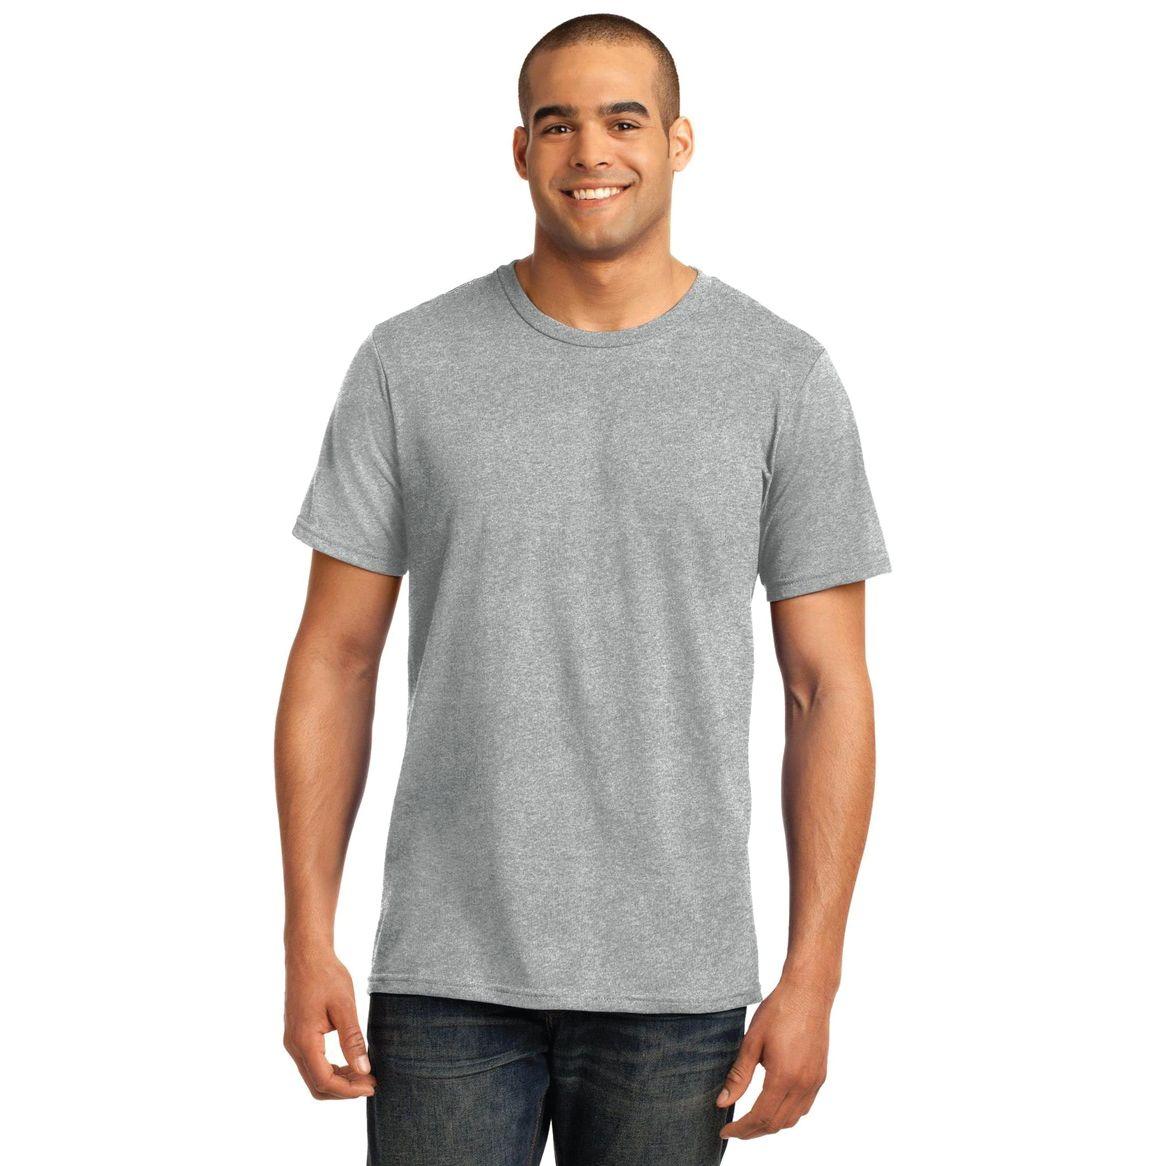 60cd151067b1 Anvil 980 Adult Lightweight T-Shirt - American Printworks